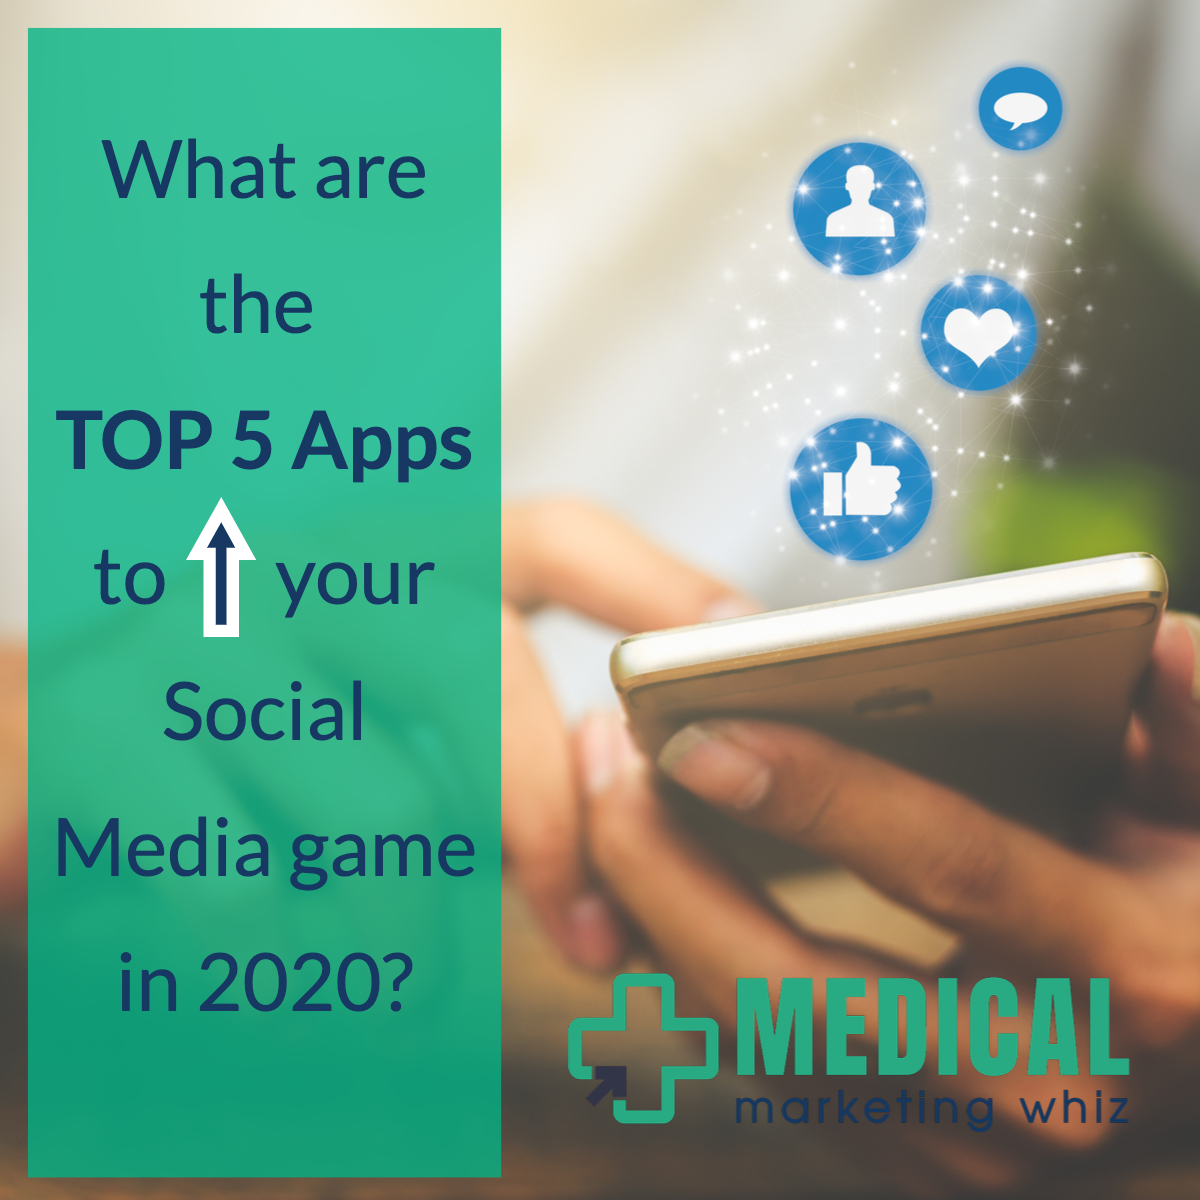 Best social media apps for doctors